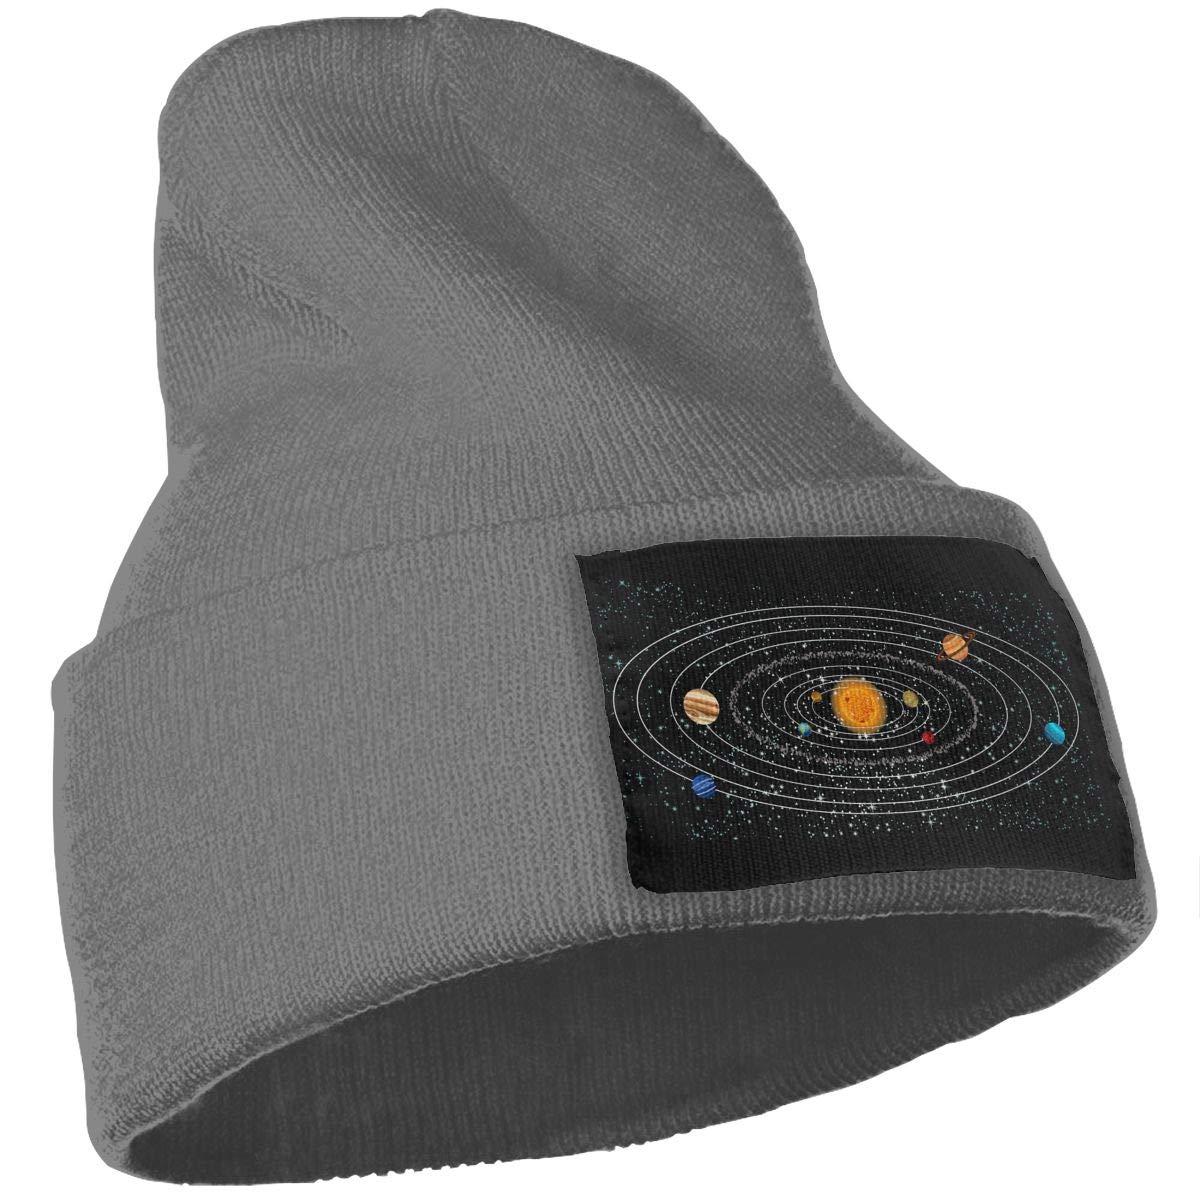 Solar System Fashion Ski Cap WHOO93@Y Mens Womens 100/% Acrylic Knitted Hat Cap